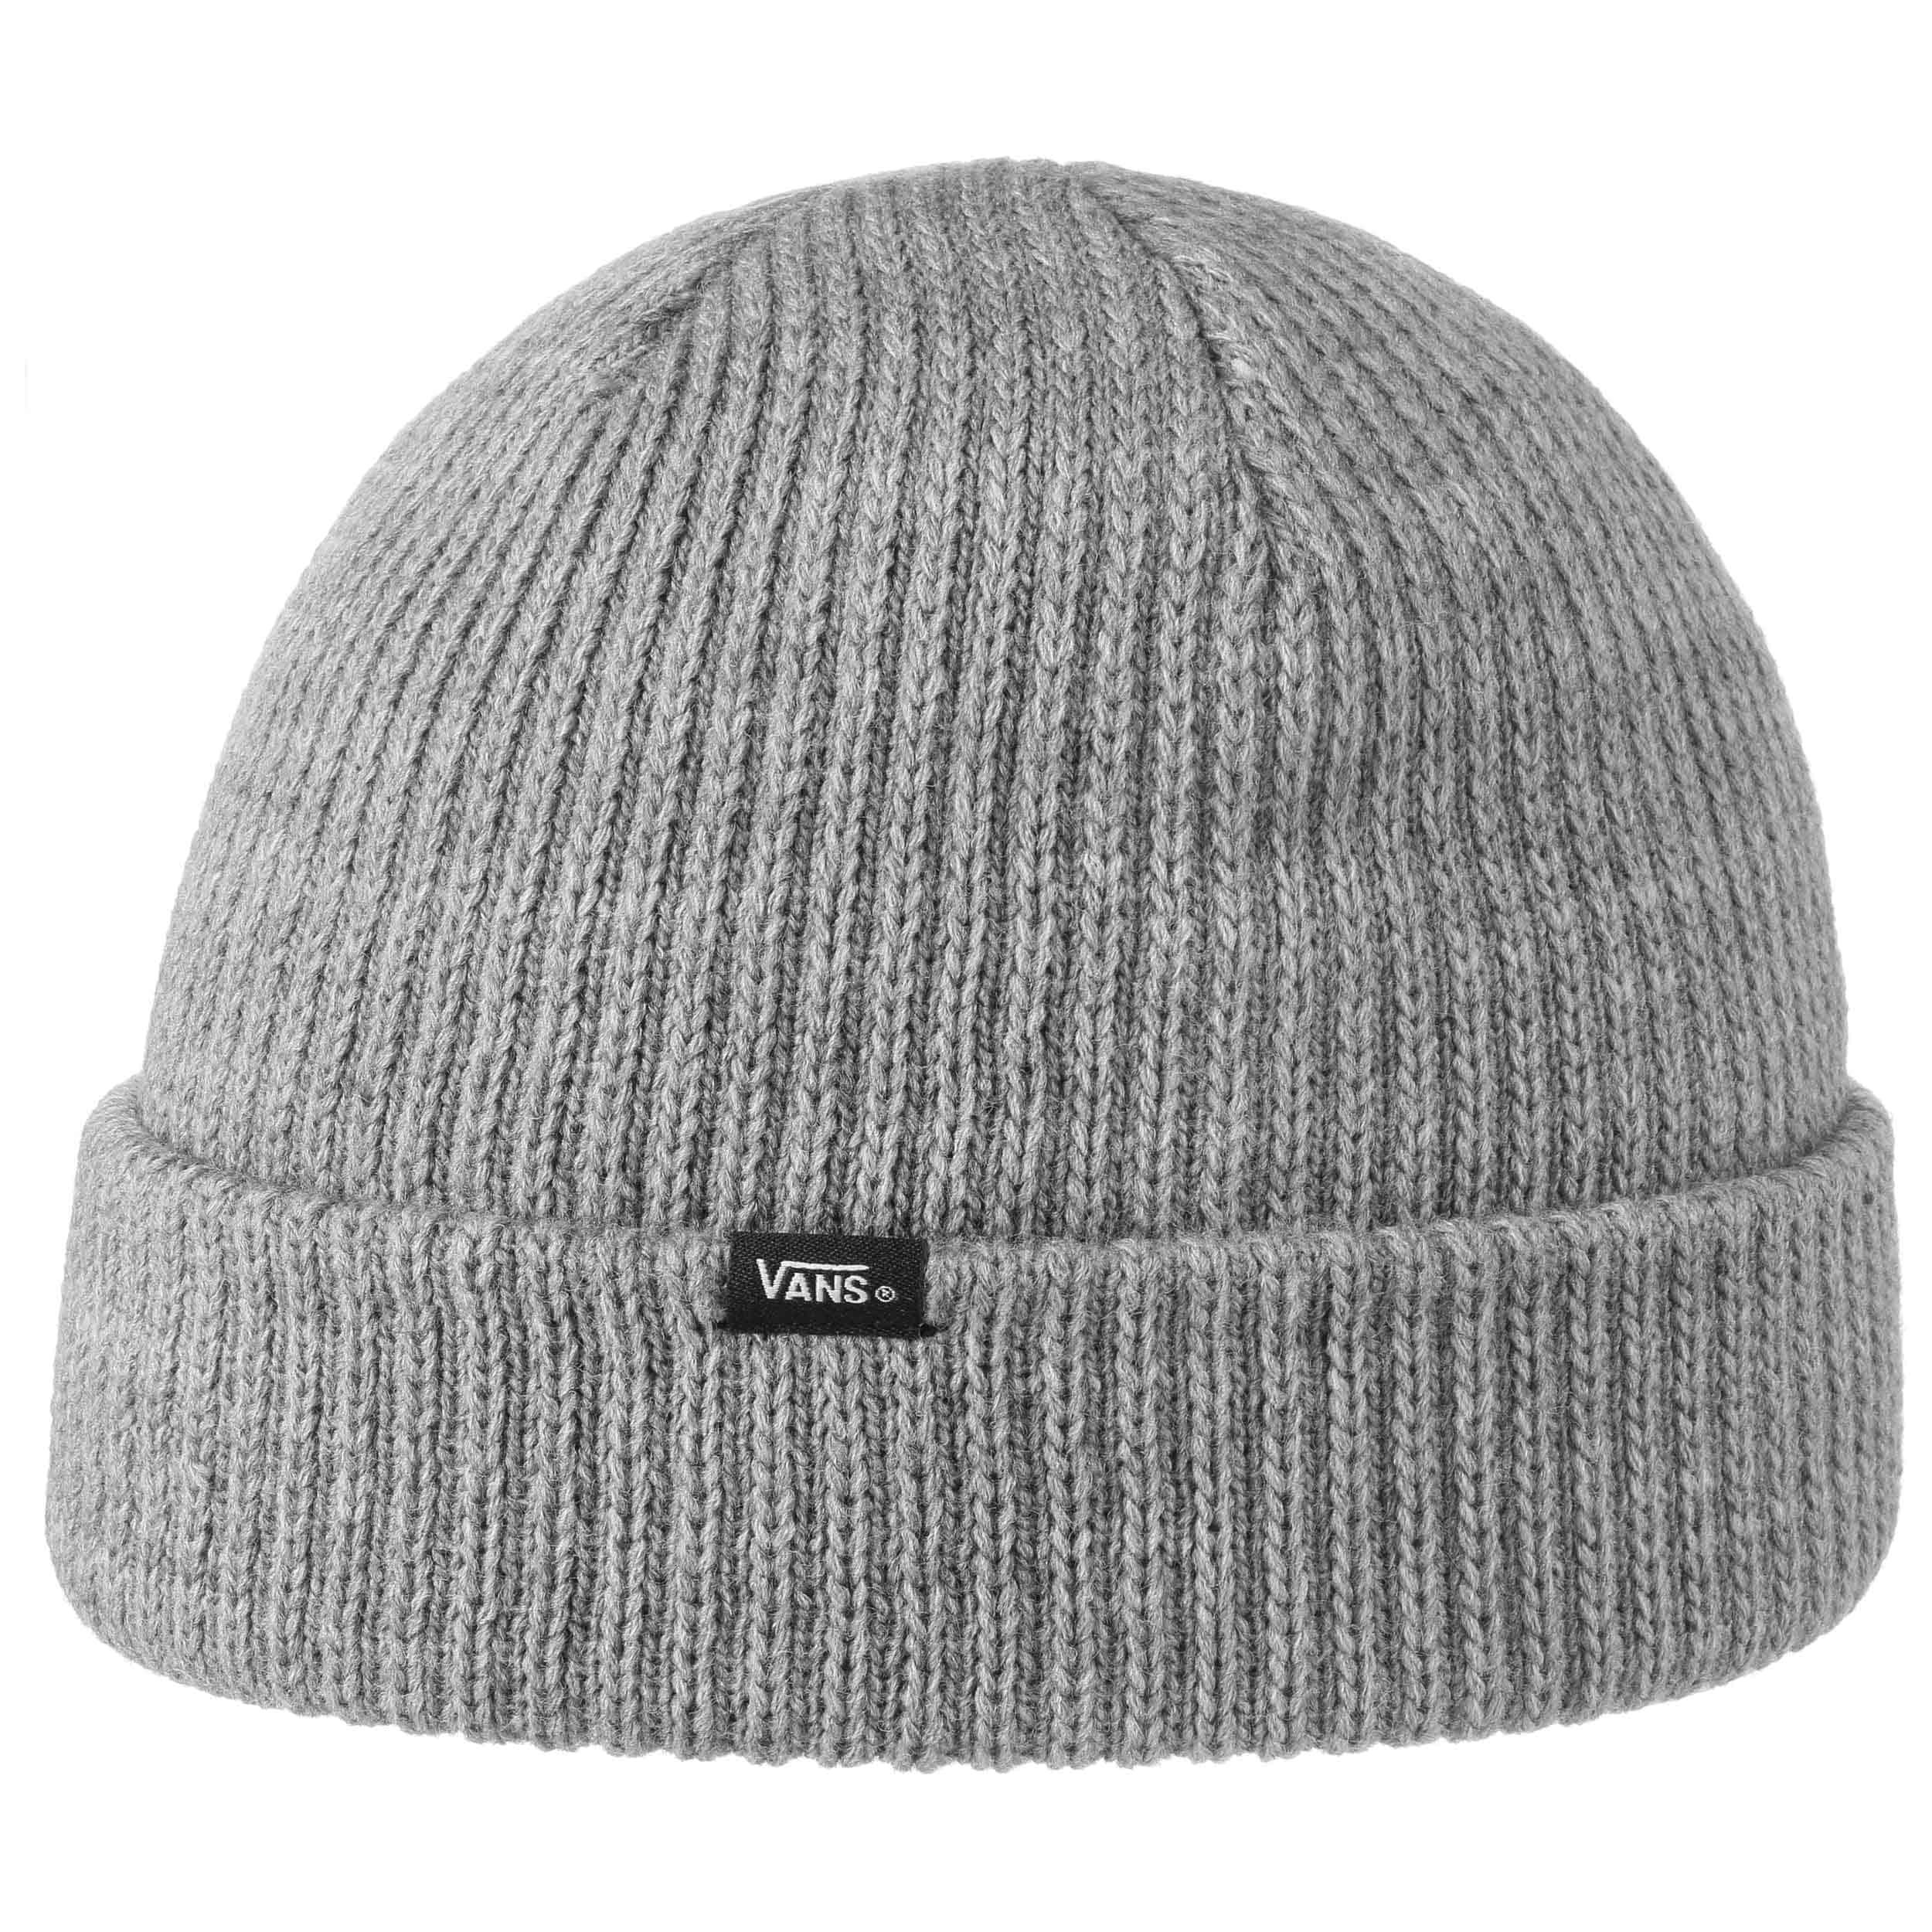 ... Basic Beanie Knit Hat by Vans - 1 ... 2a3cdc86f1f